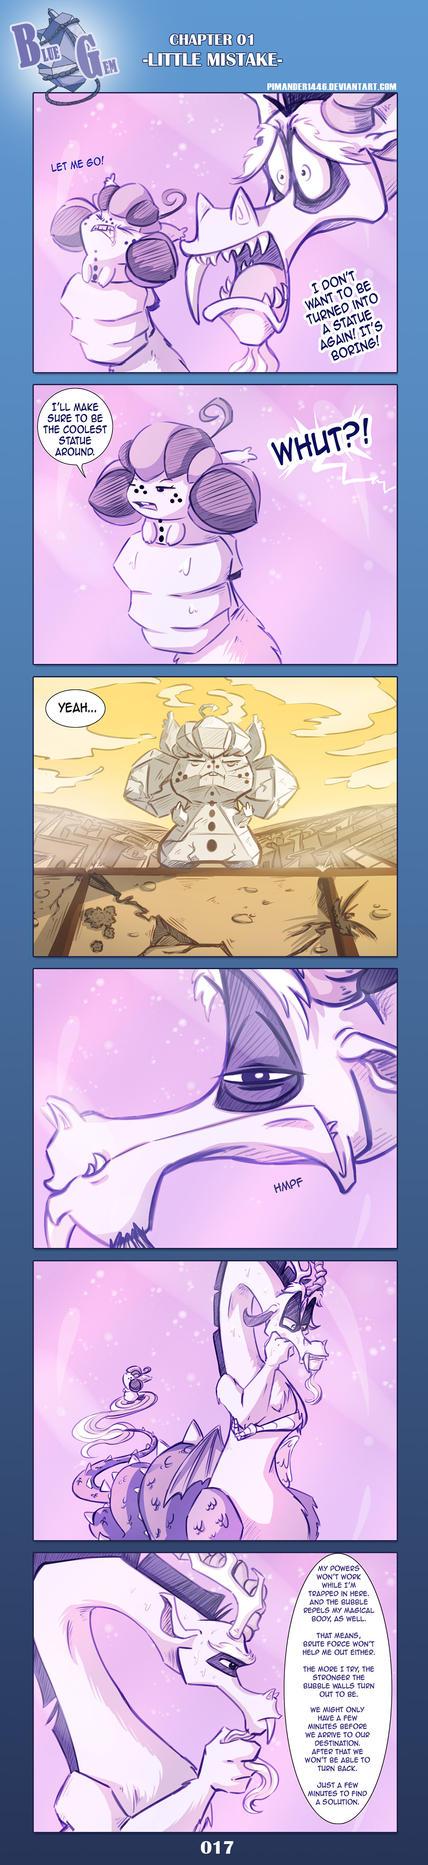 BlueGem COMIC -- Page 017 by Pimander1446